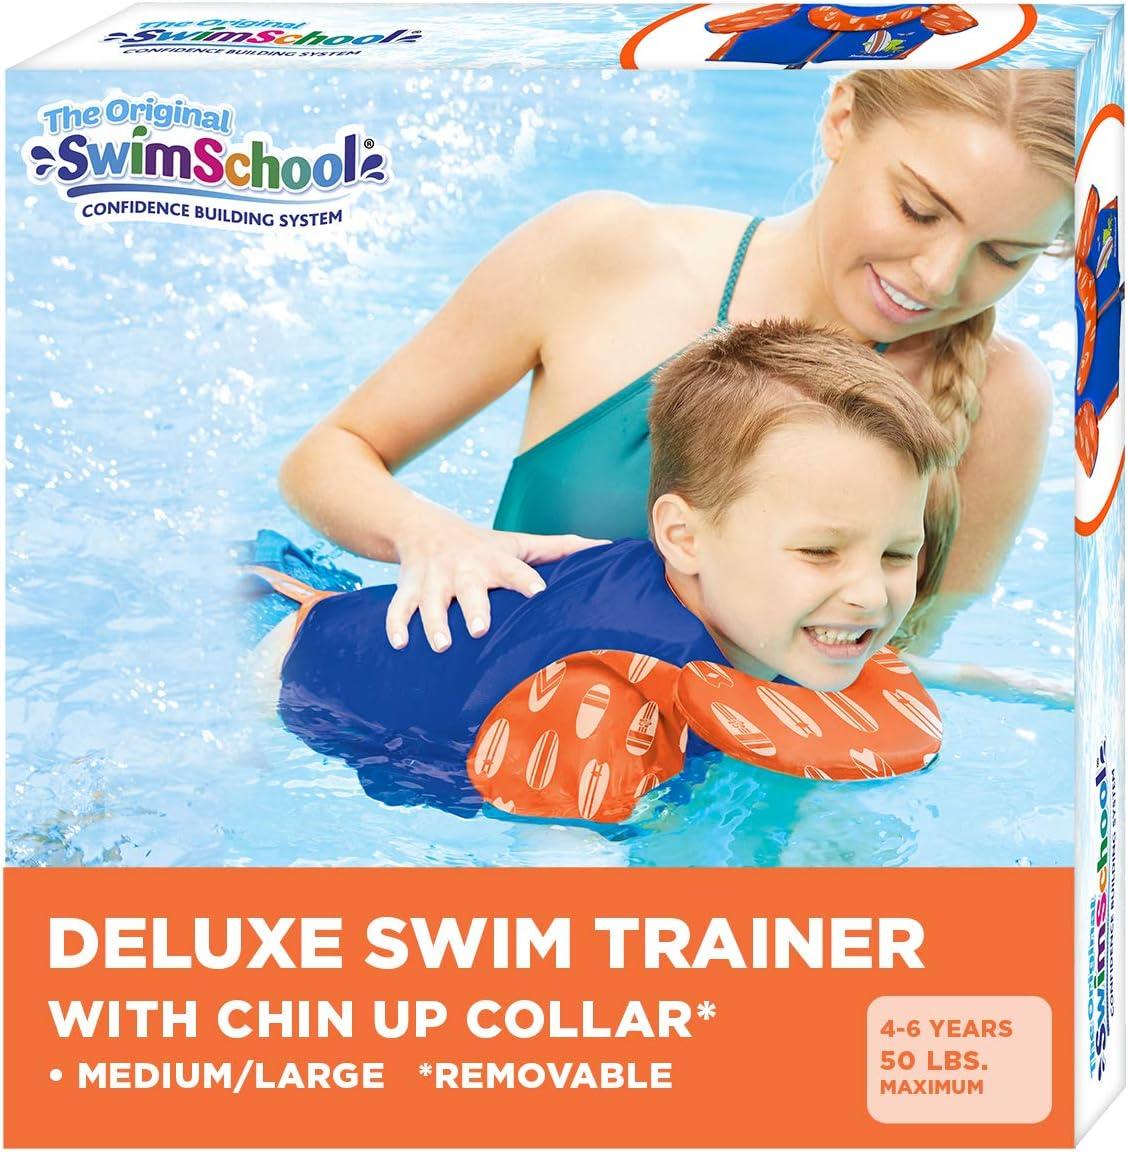 Swim Trainer Vest with UPF50 Shoulder Sleeves, Stretchable Fabric, Flex-Form Design, Adjustable Safety Strap, Medium/Large, Up to 50 Lbs., Blue/Orange